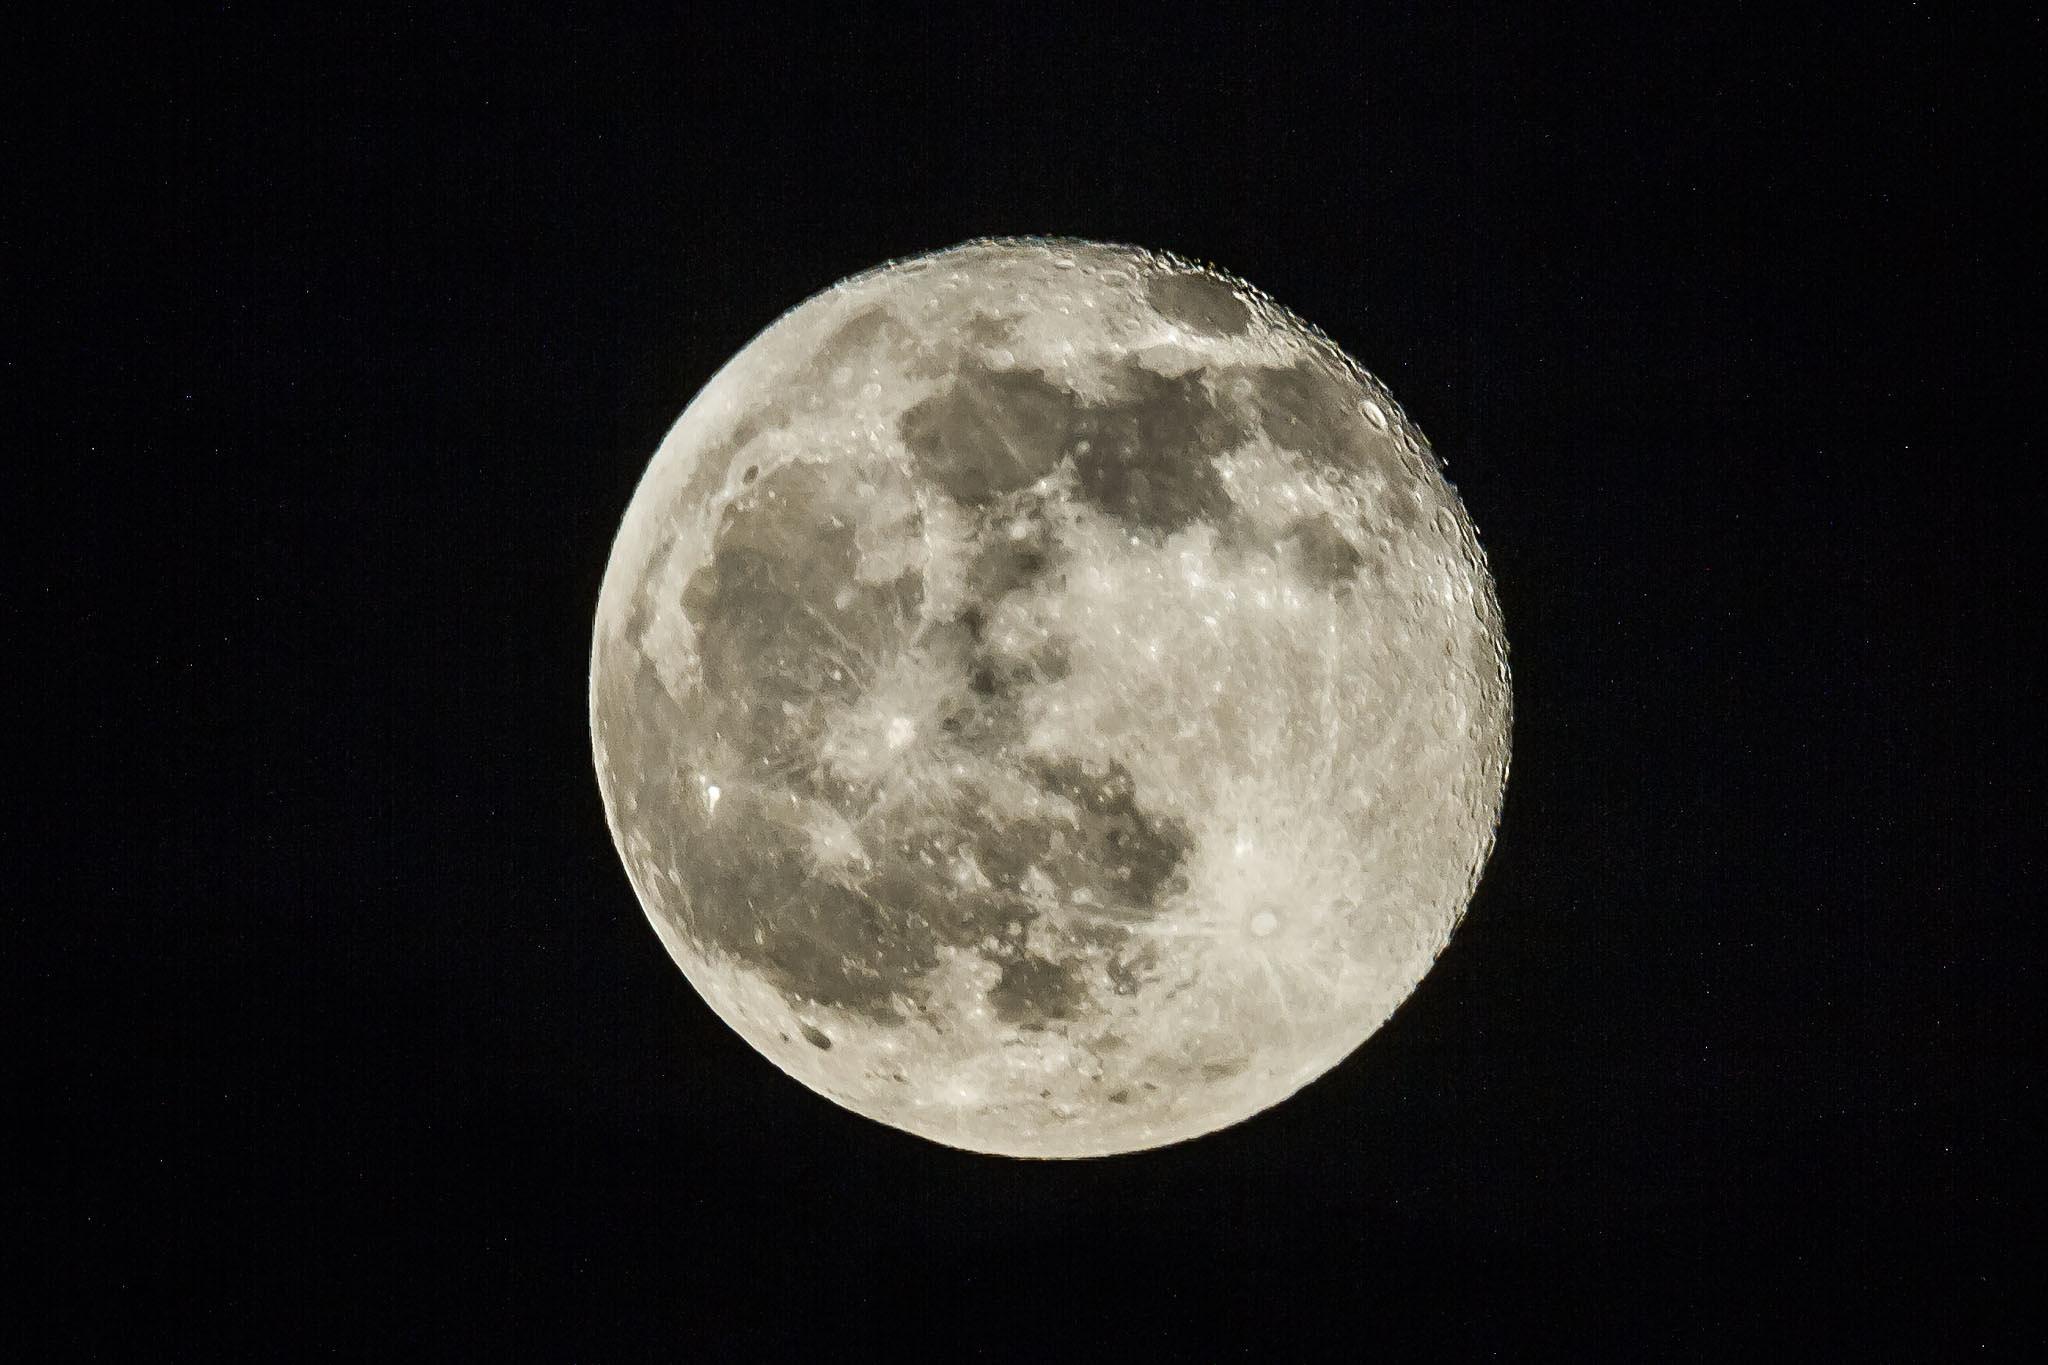 Full moon by detlefkoester